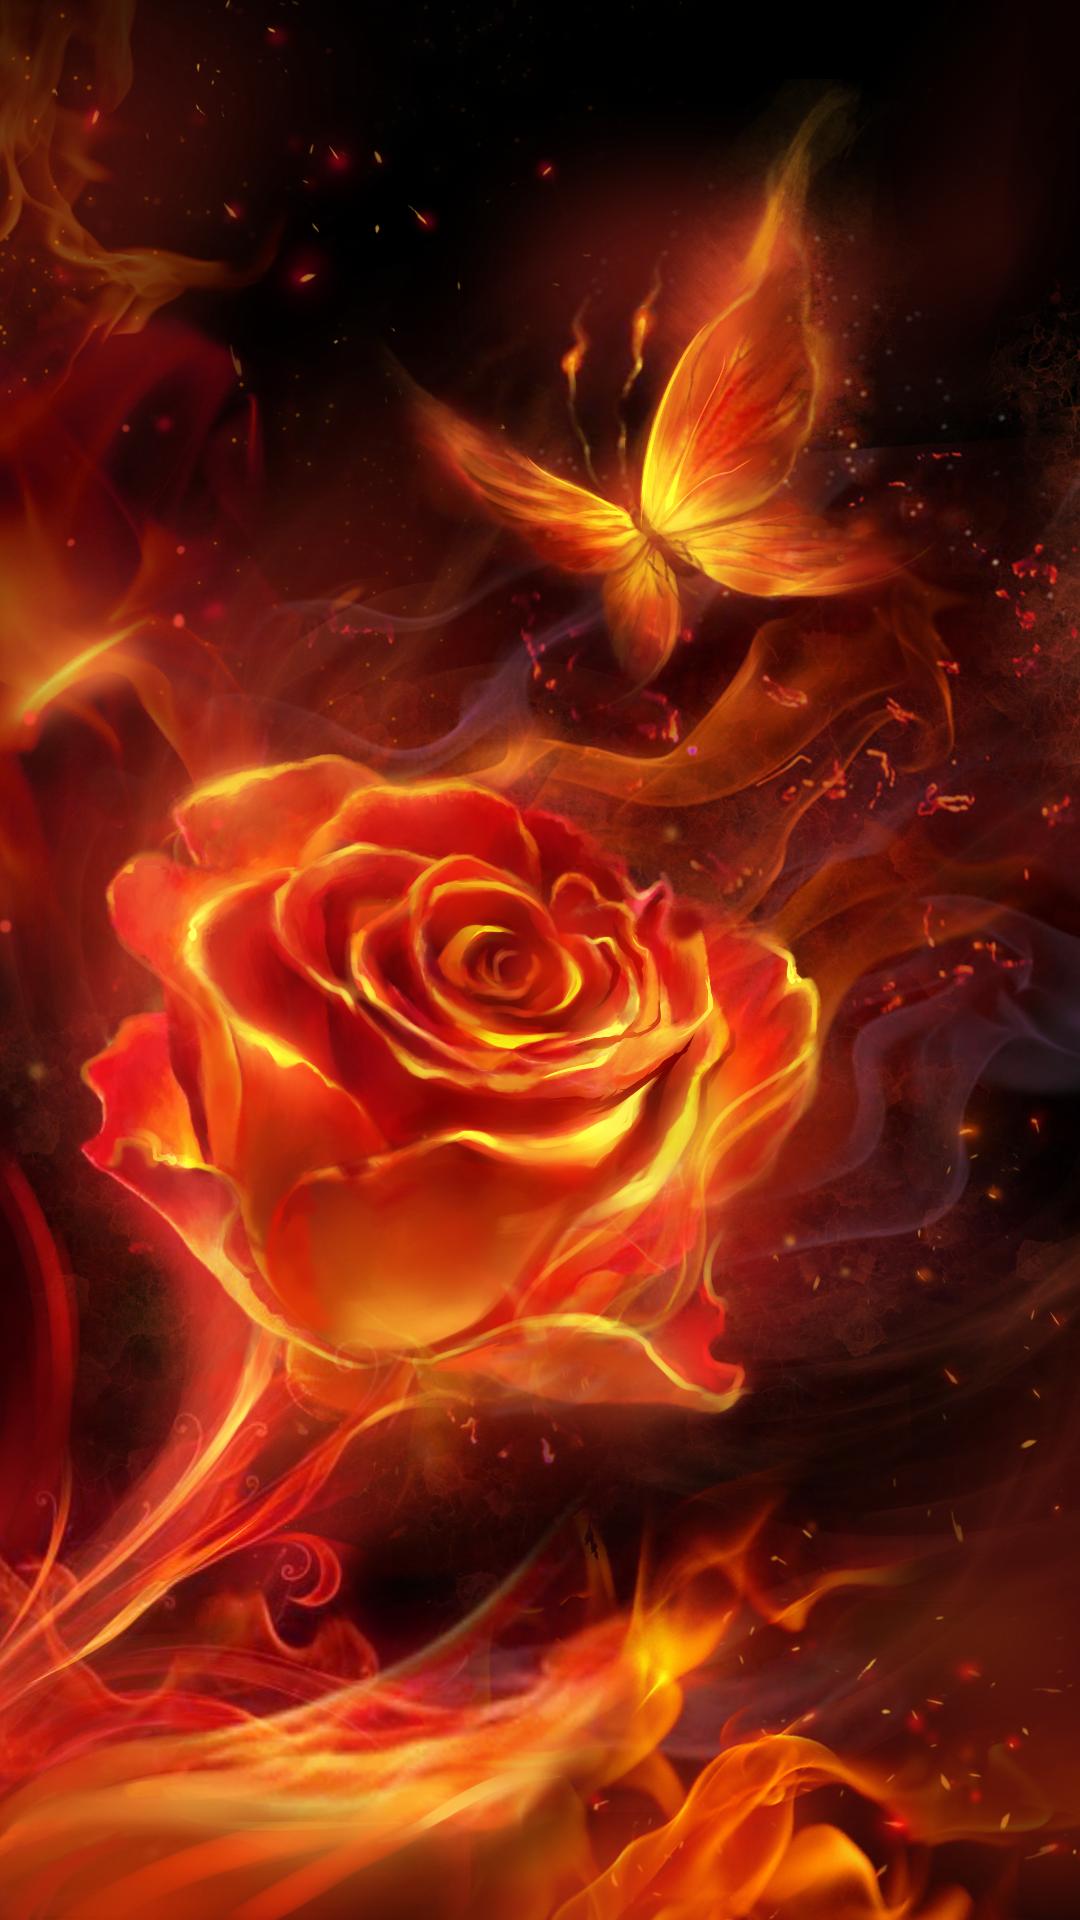 Fiery Rose And Butterfly Flame Live Wallpaper Cicekli Baski Fraktal Sanati Soyut Resim Tuval